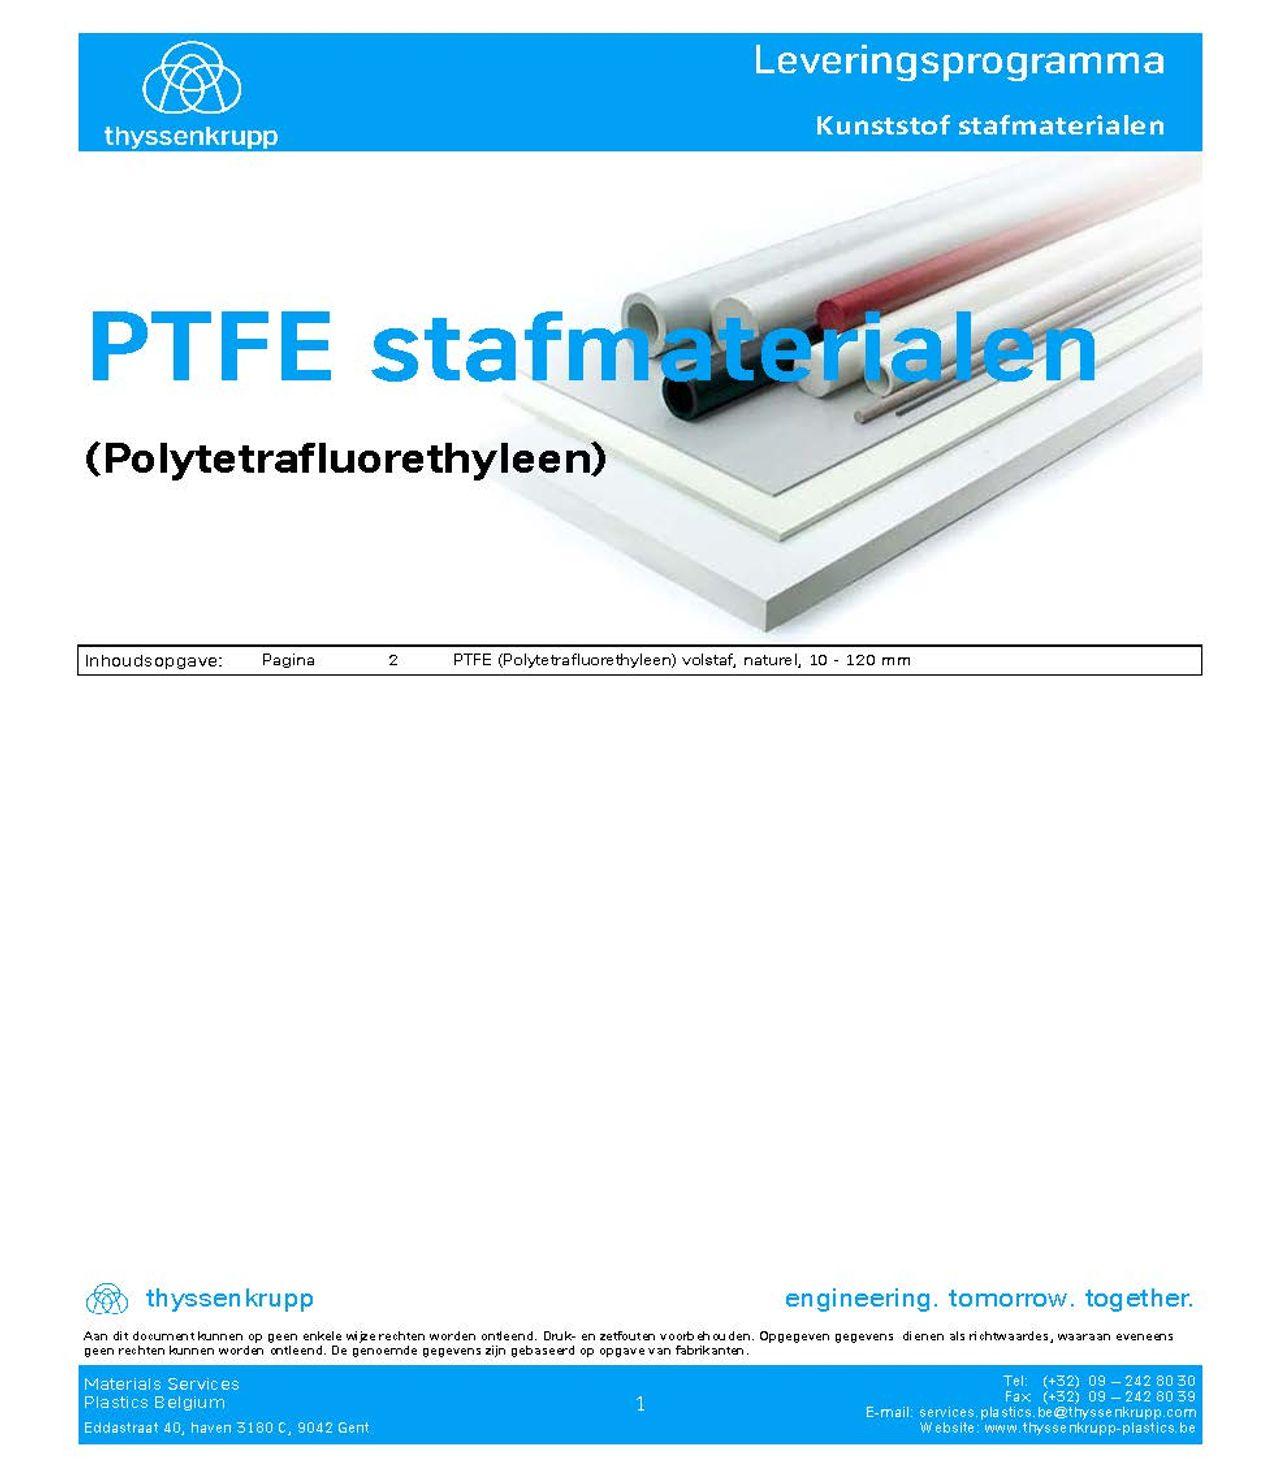 afbeelding cover PTFE staf leveringsprogramma